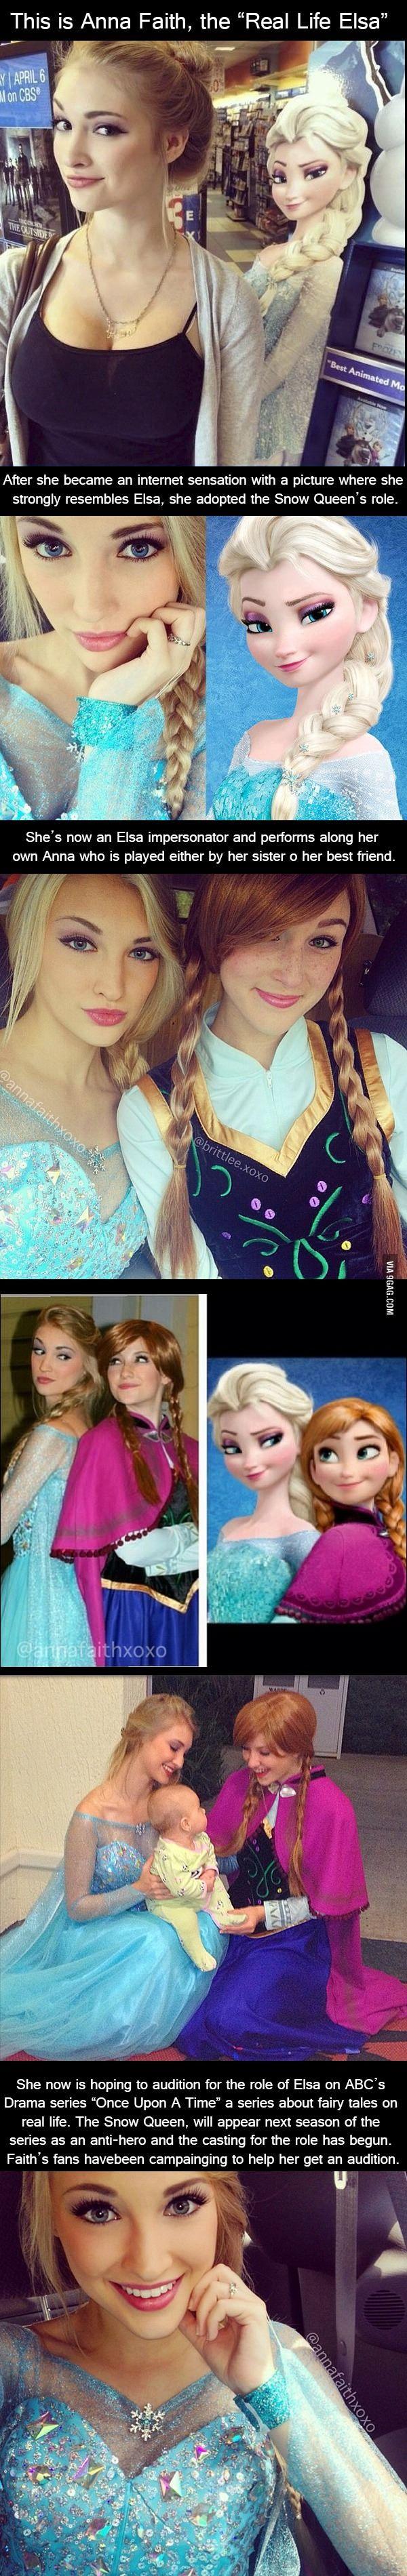 Meet The real life version of Elsa.